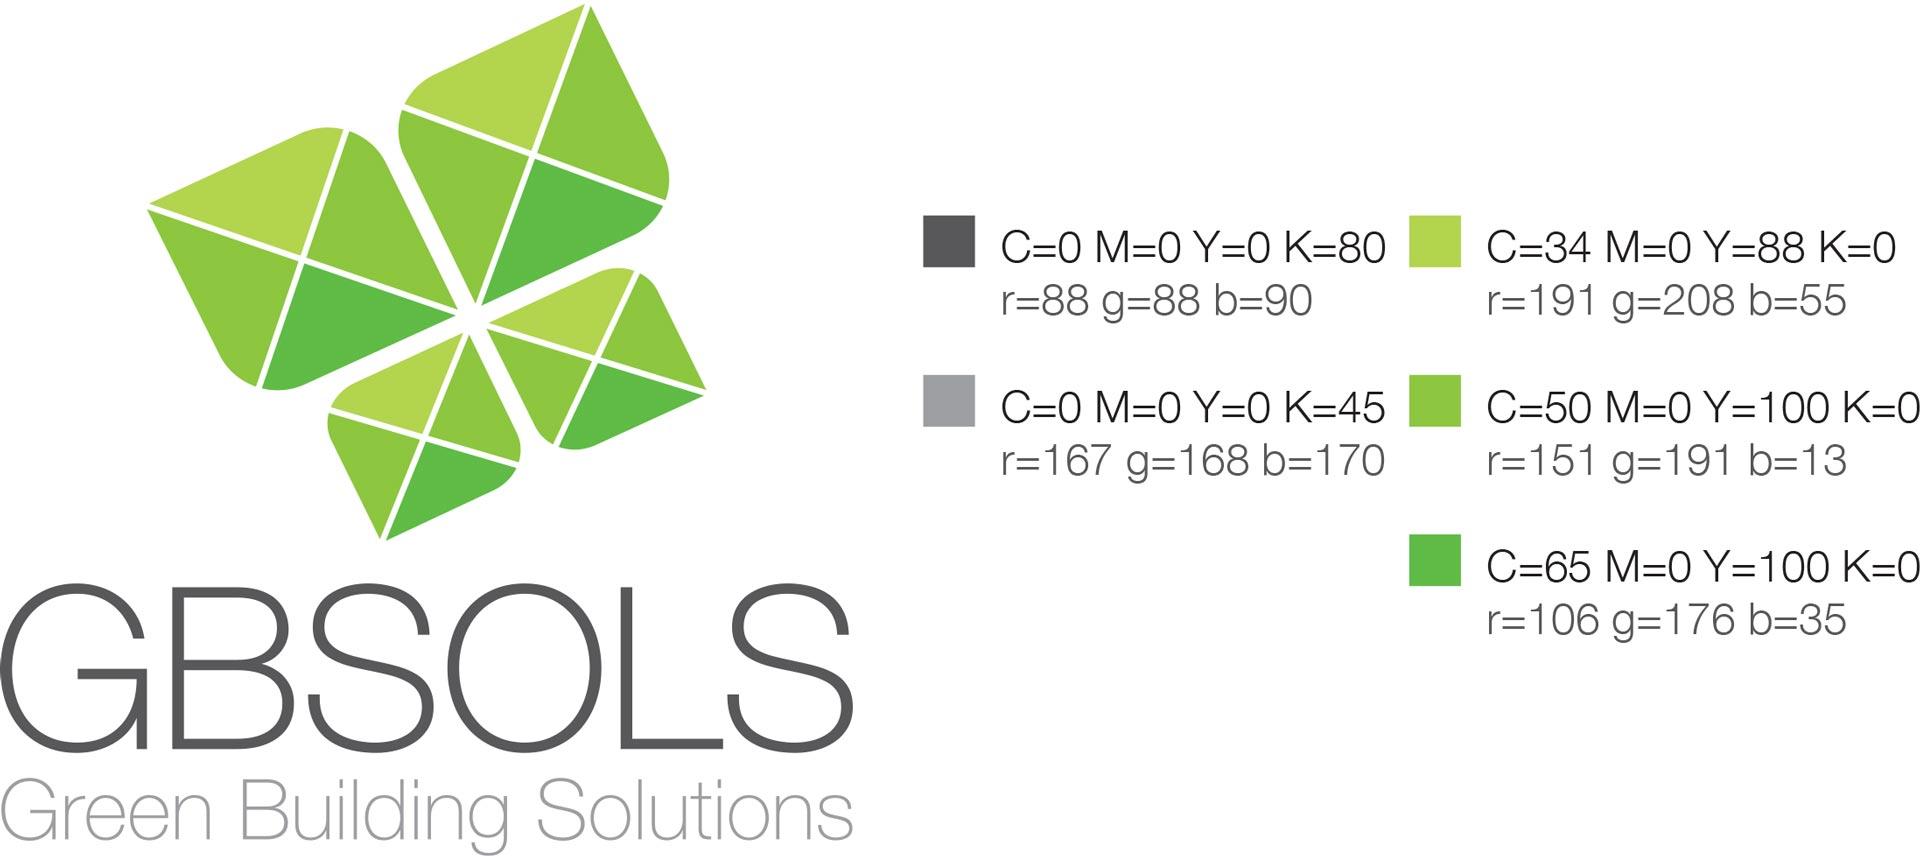 design-logo-gbsols-palette-colore